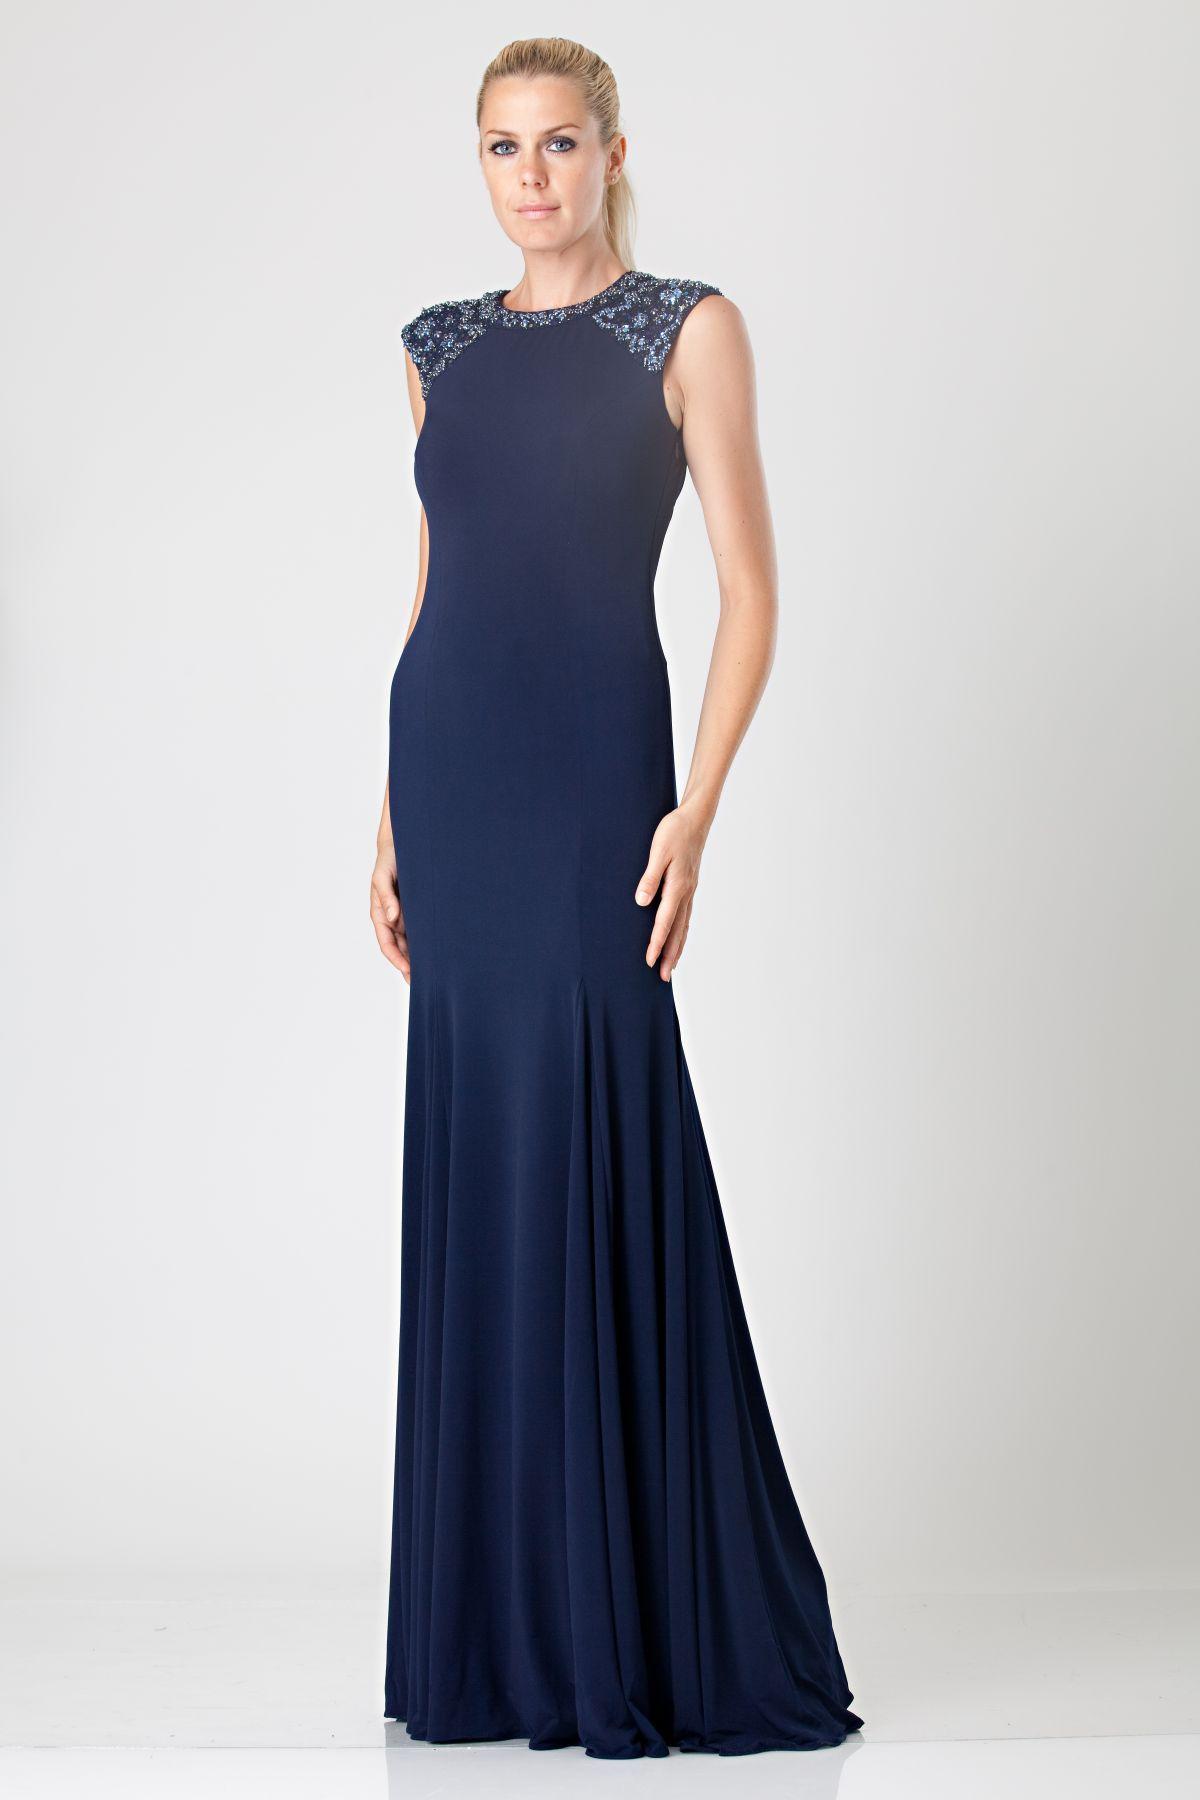 Js collections vestido missesdressy roupas de festa